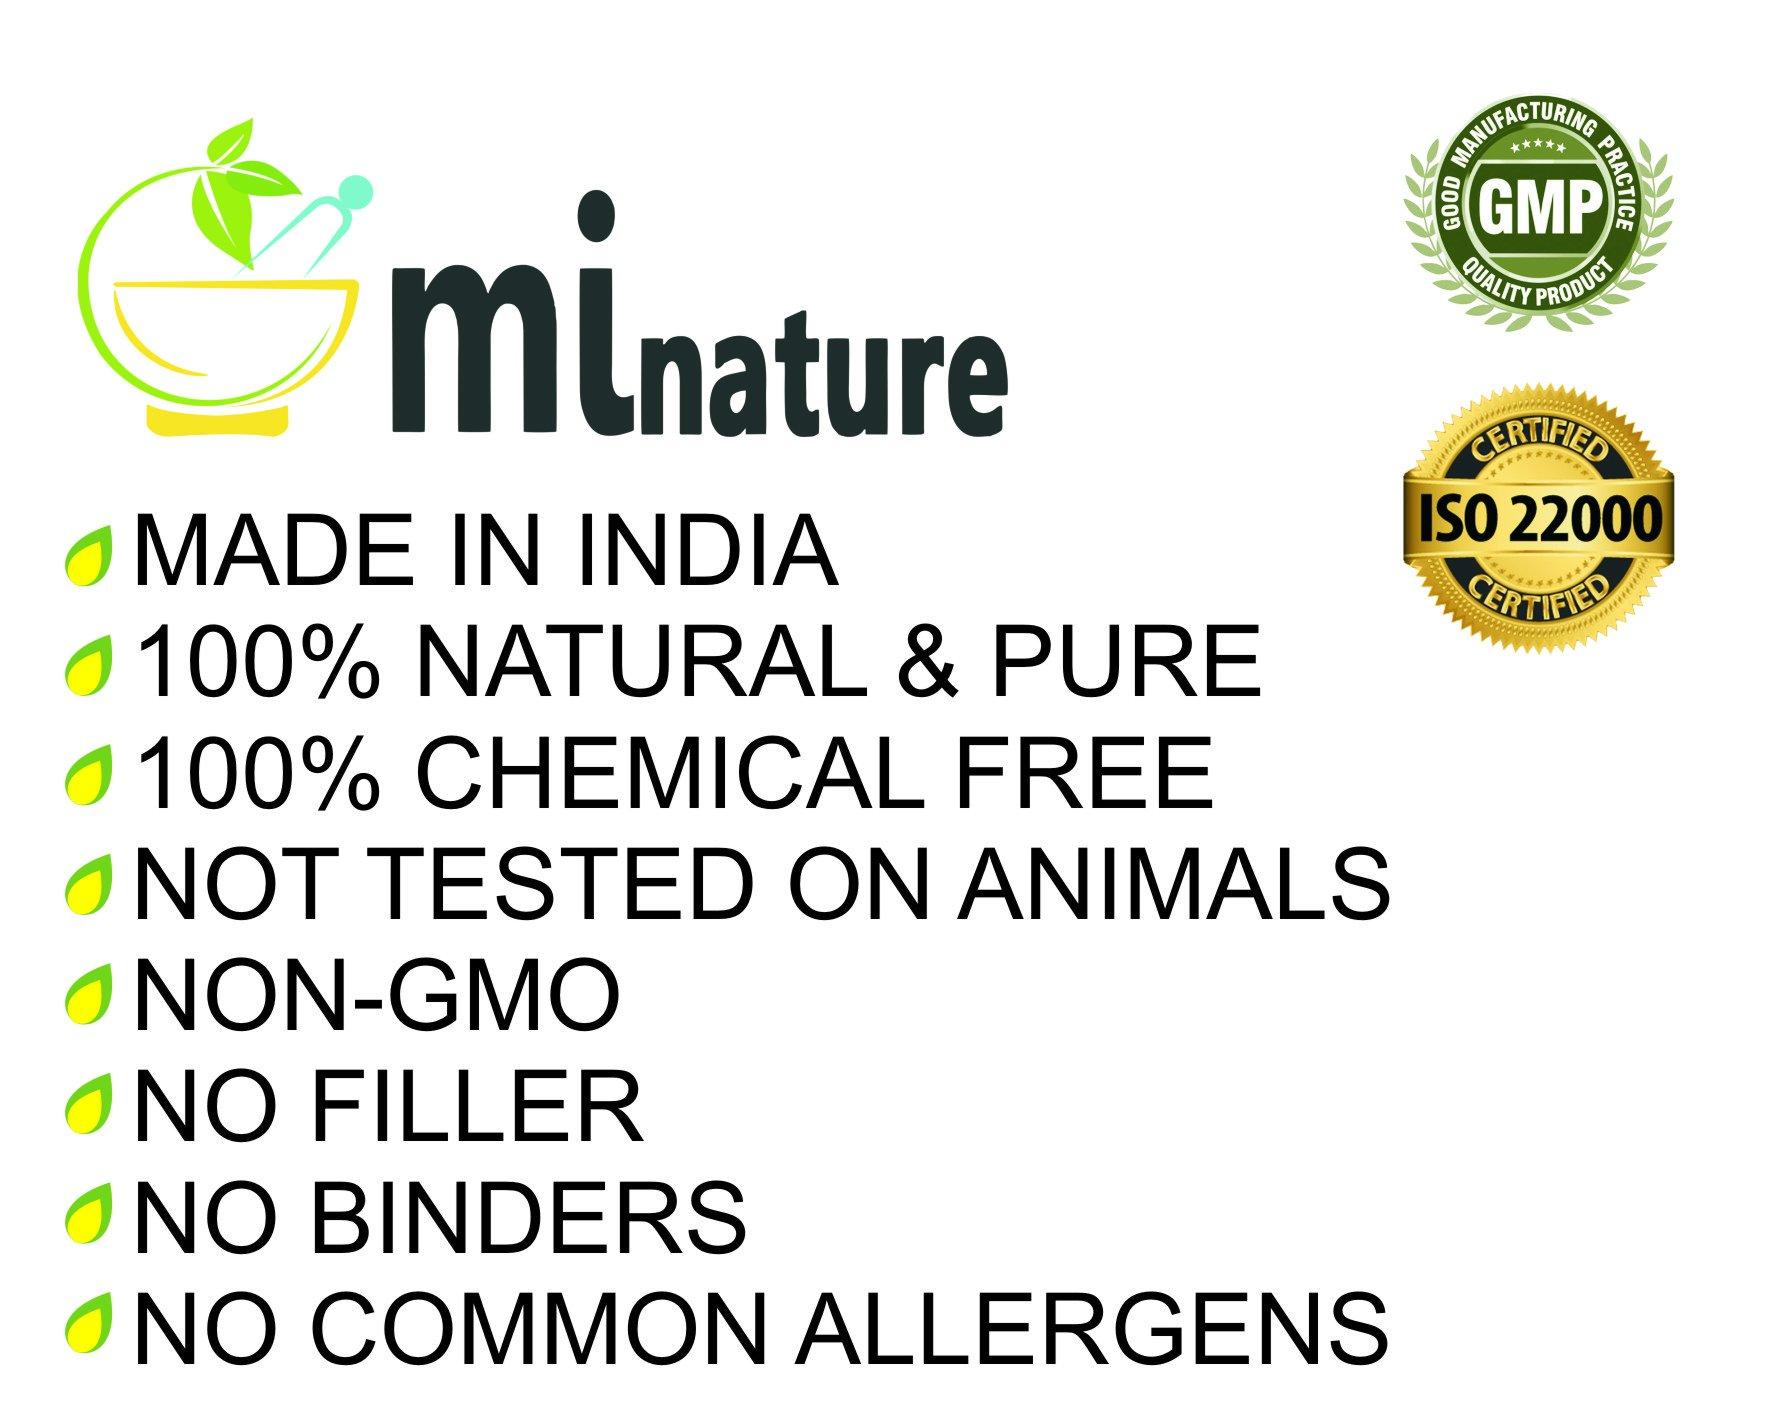 mi nature Indigo Powder -INDIGOFERA TINCTORIA,(100% NATURAL, ORGANICALLY GROWN) 1 LB (454 grams/16 ounces) RESEALABLE BAG by mi nature (Image #3)